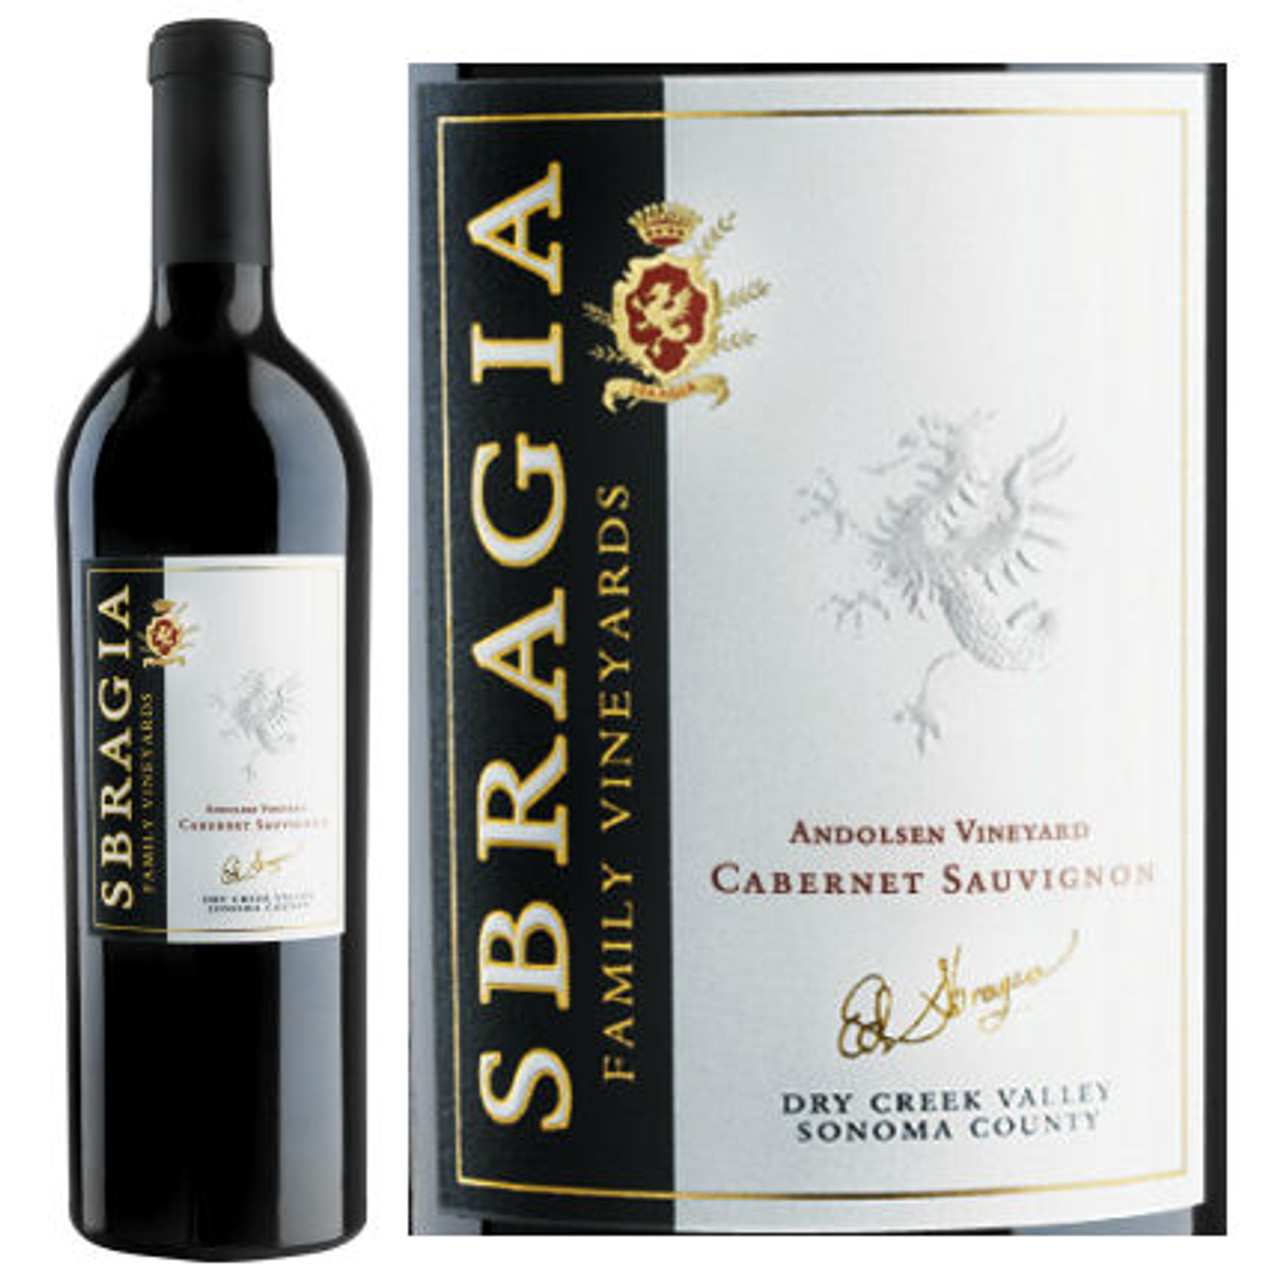 Sbragia Family Andolsen Vineyard Dry Creek Cabernet